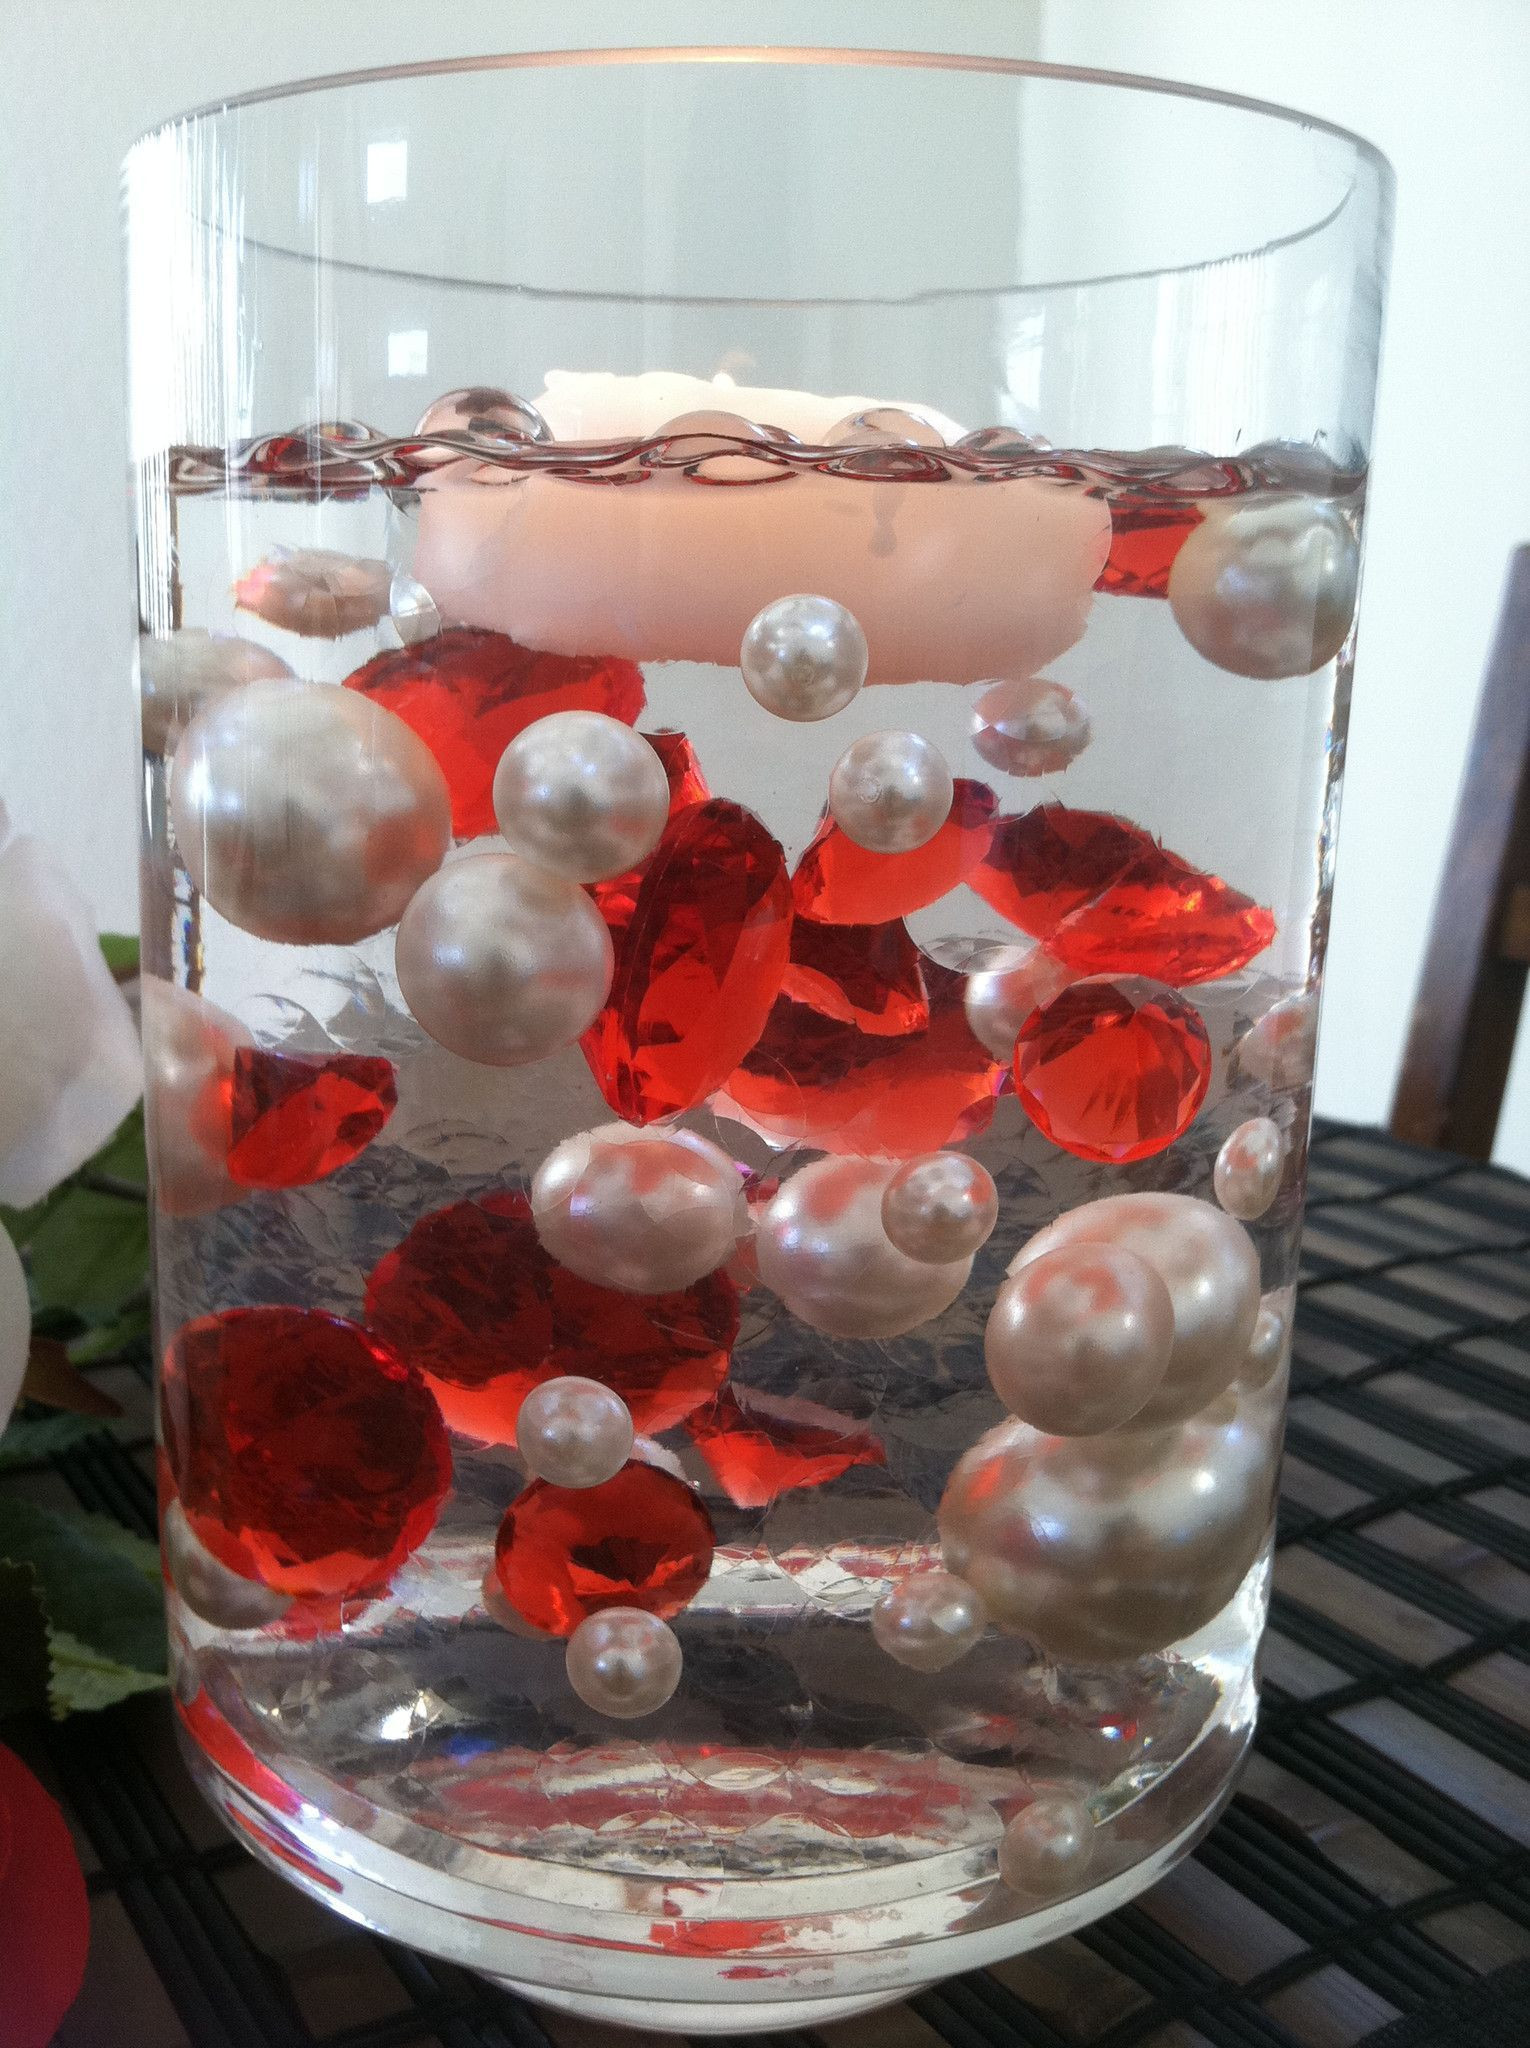 aqua gel beads vase filler of floating diamonds and pearl centerpiece vase filler gems table for floating diamonds and pearl centerpiece vase filler gems table scatters